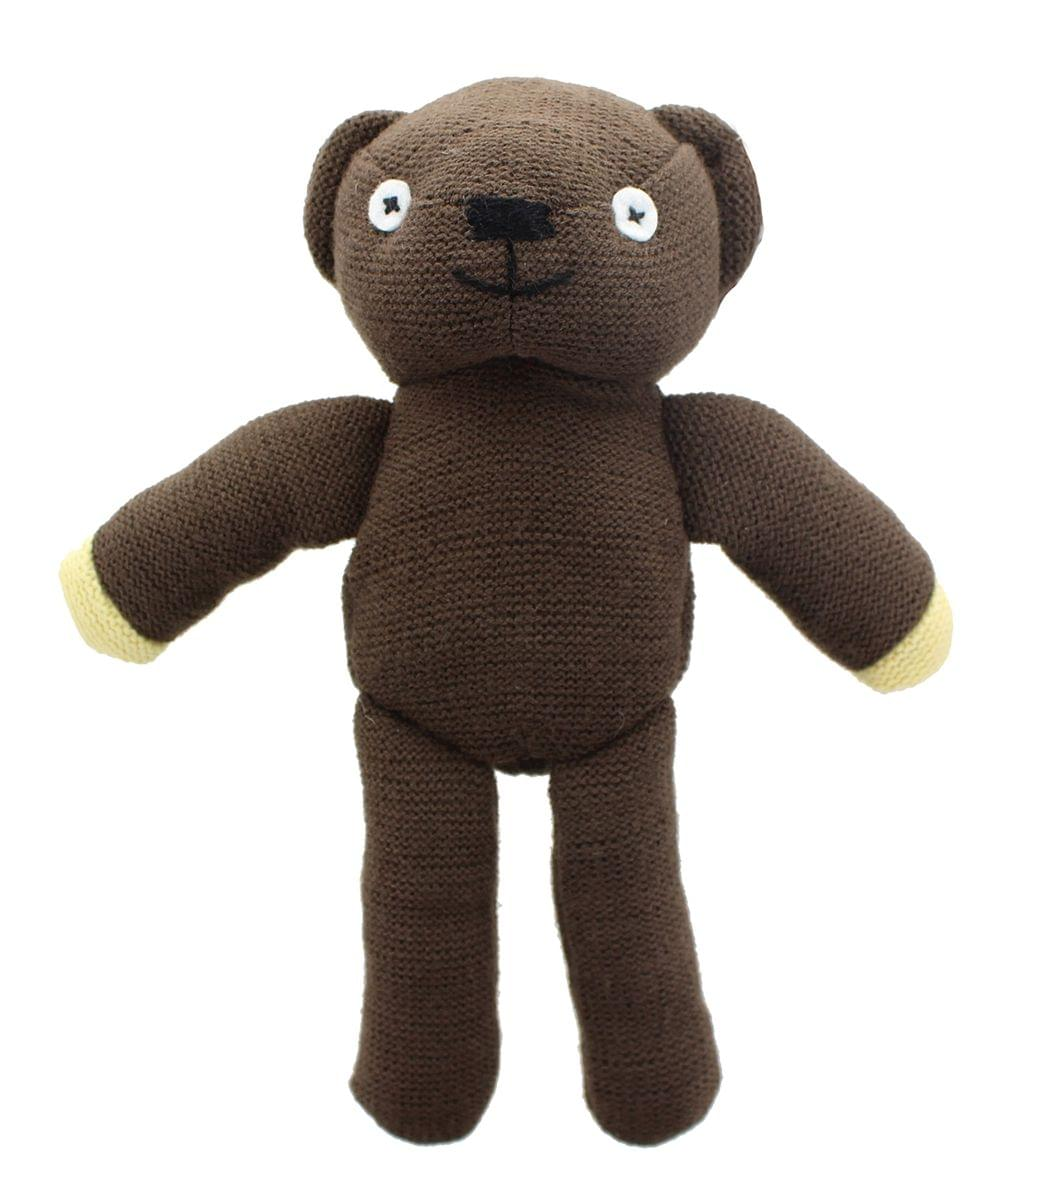 "Mr. Bean 10"" Plush Teddy Bear by Fiesta"